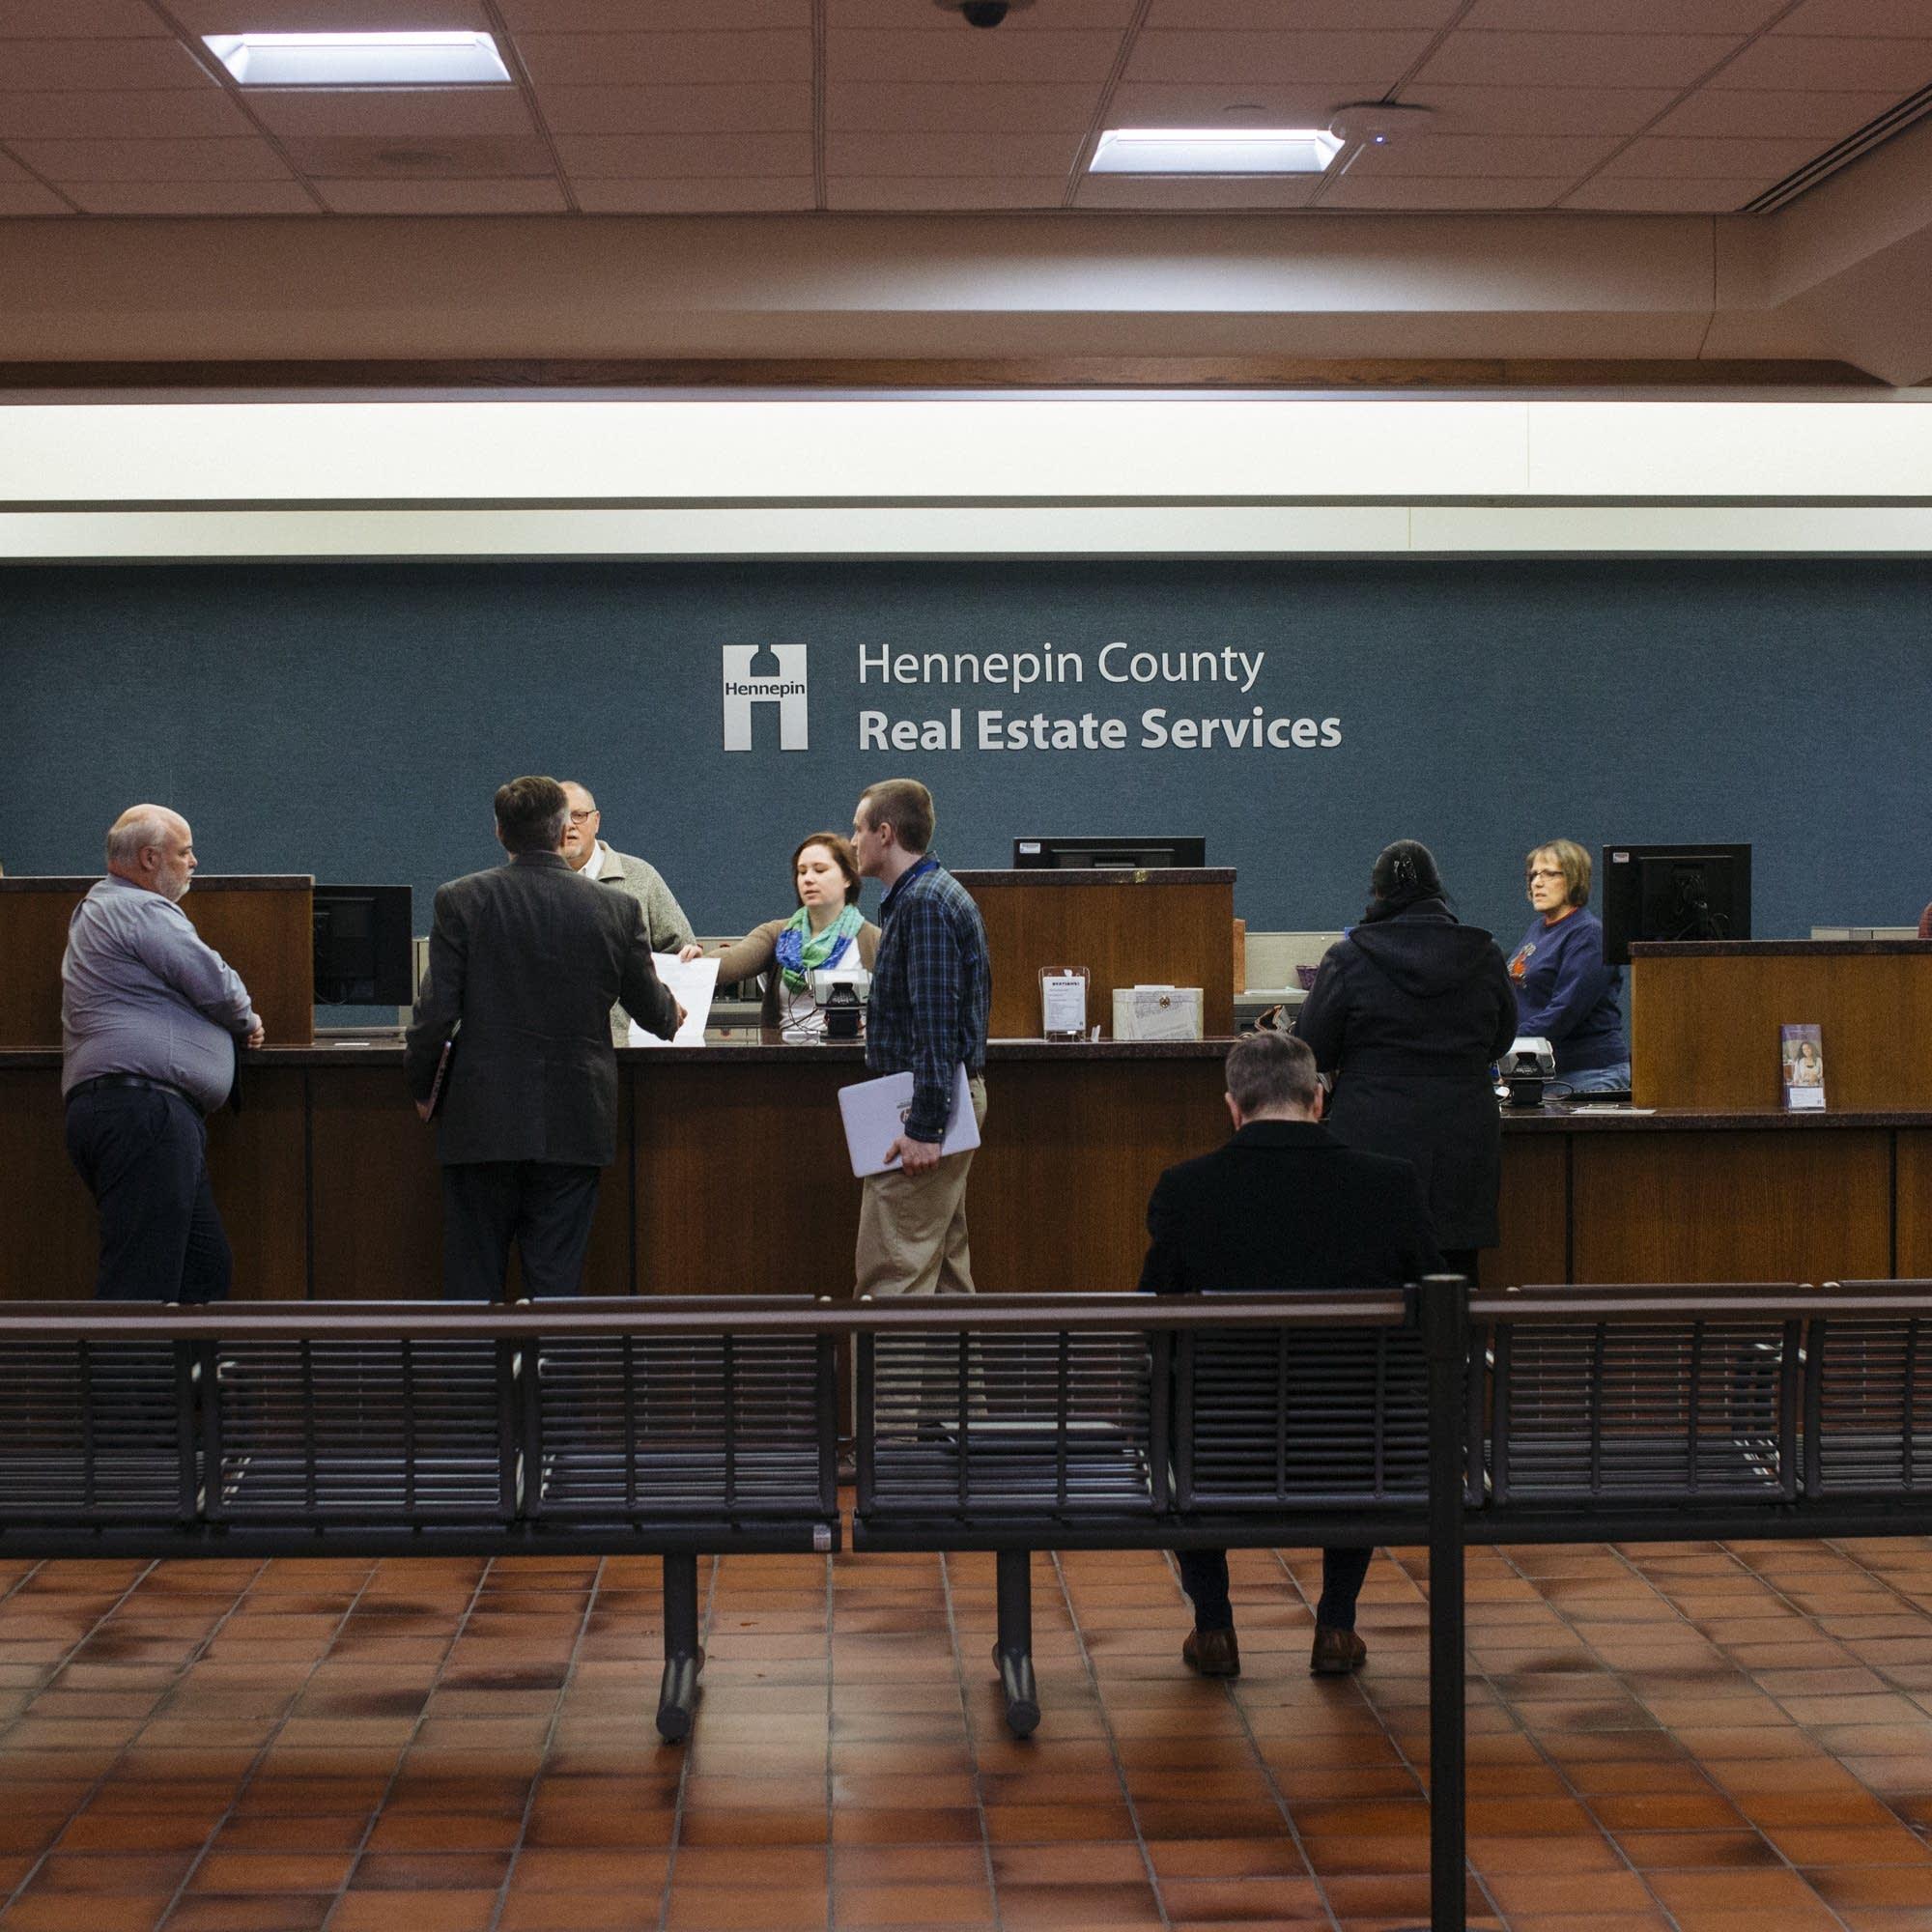 hennepin county minnesota property tax records